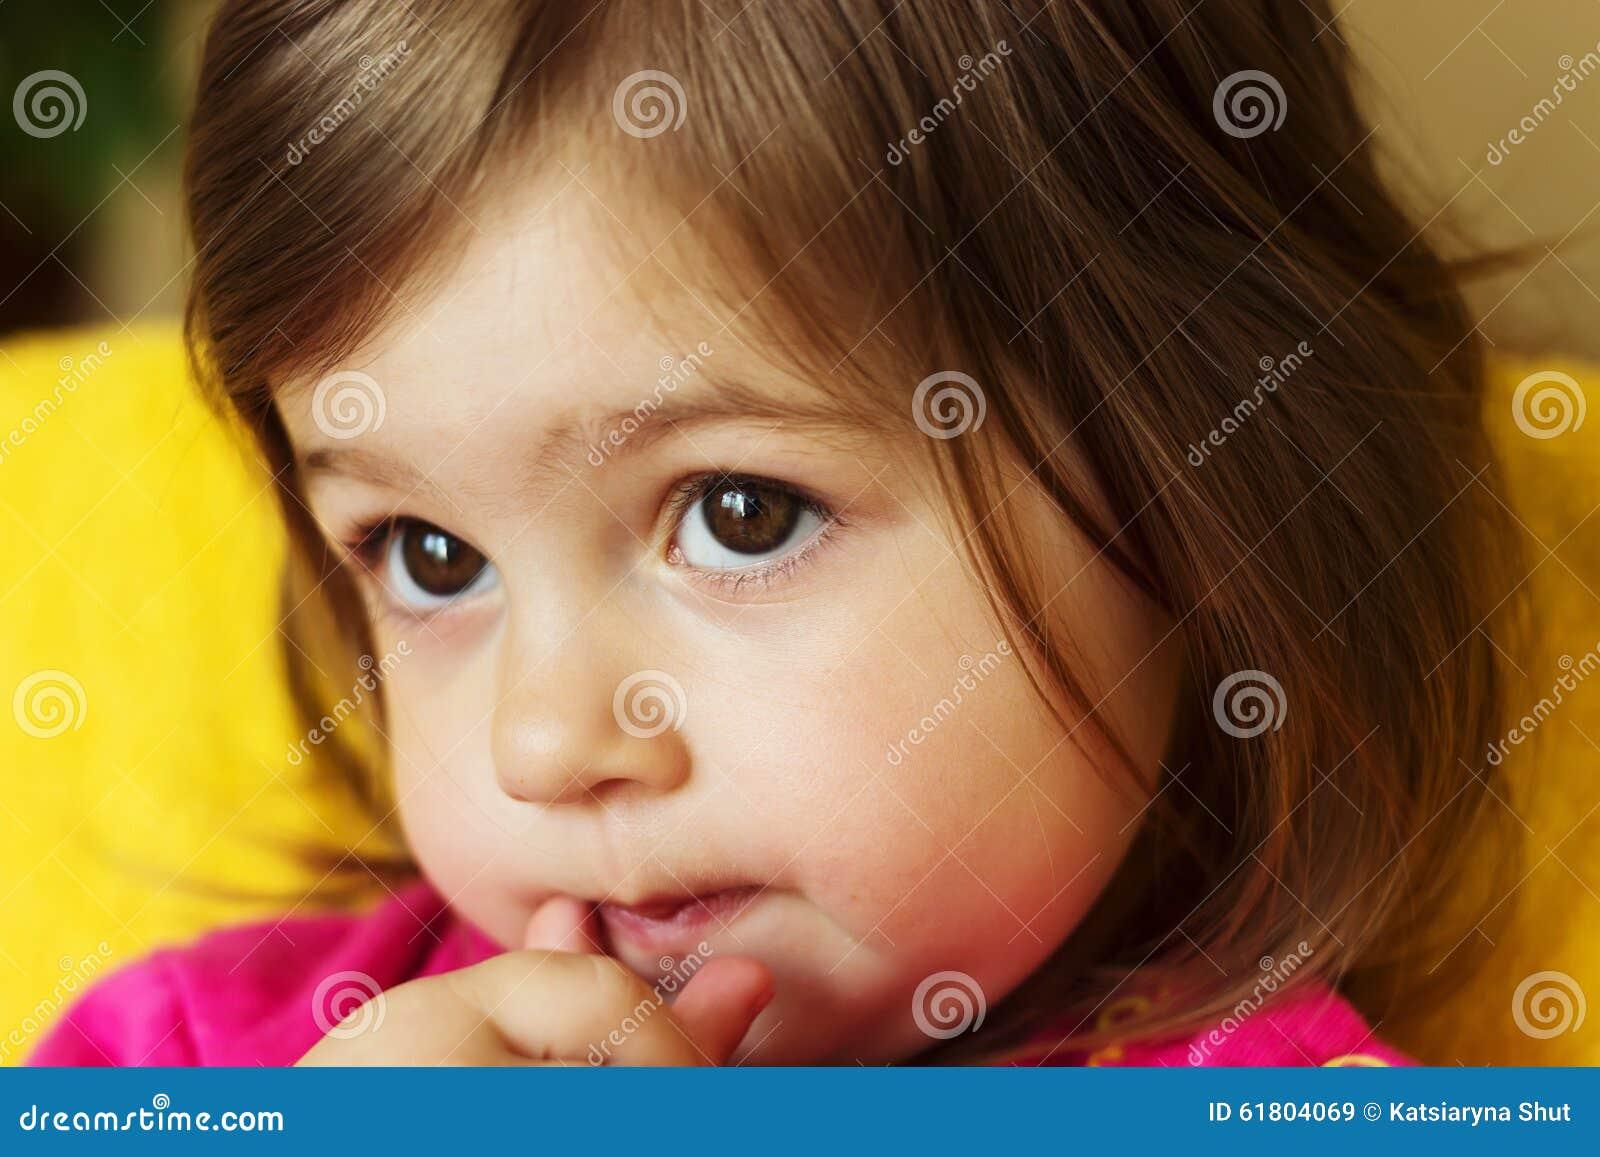 Cute little sad child thinking